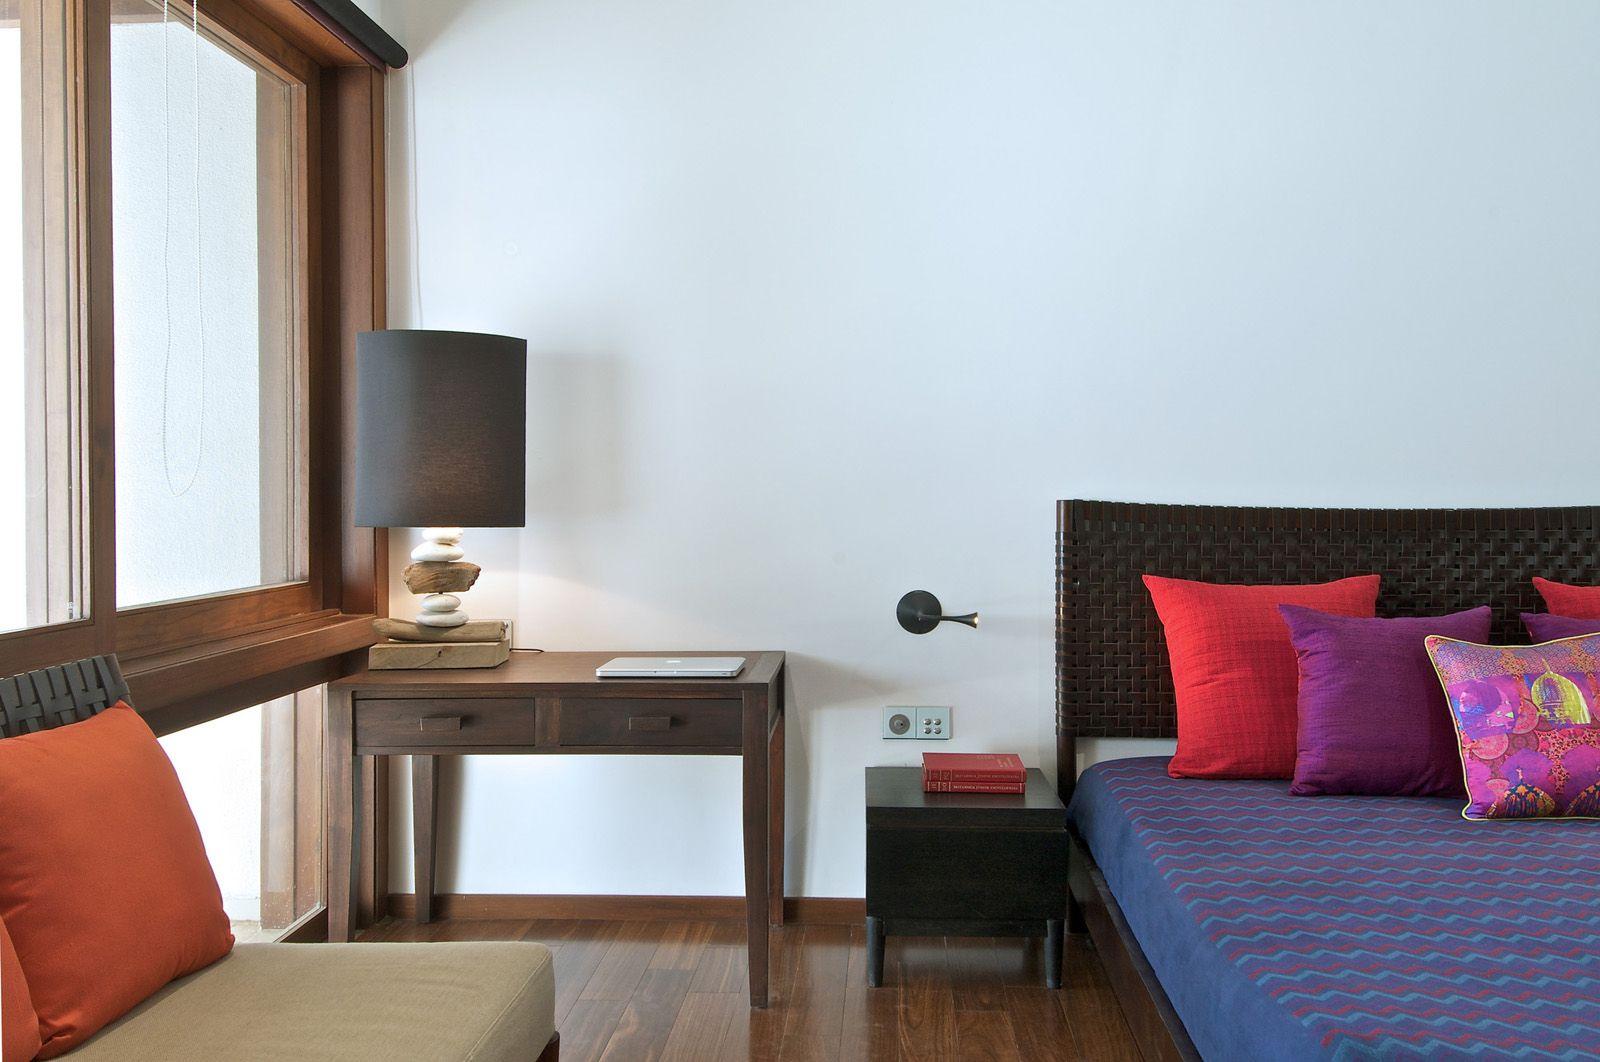 Timeless Contemporary House In India With Courtyard Zen Garden Idesignarch Interior Design Architecture Decorating Emagazine